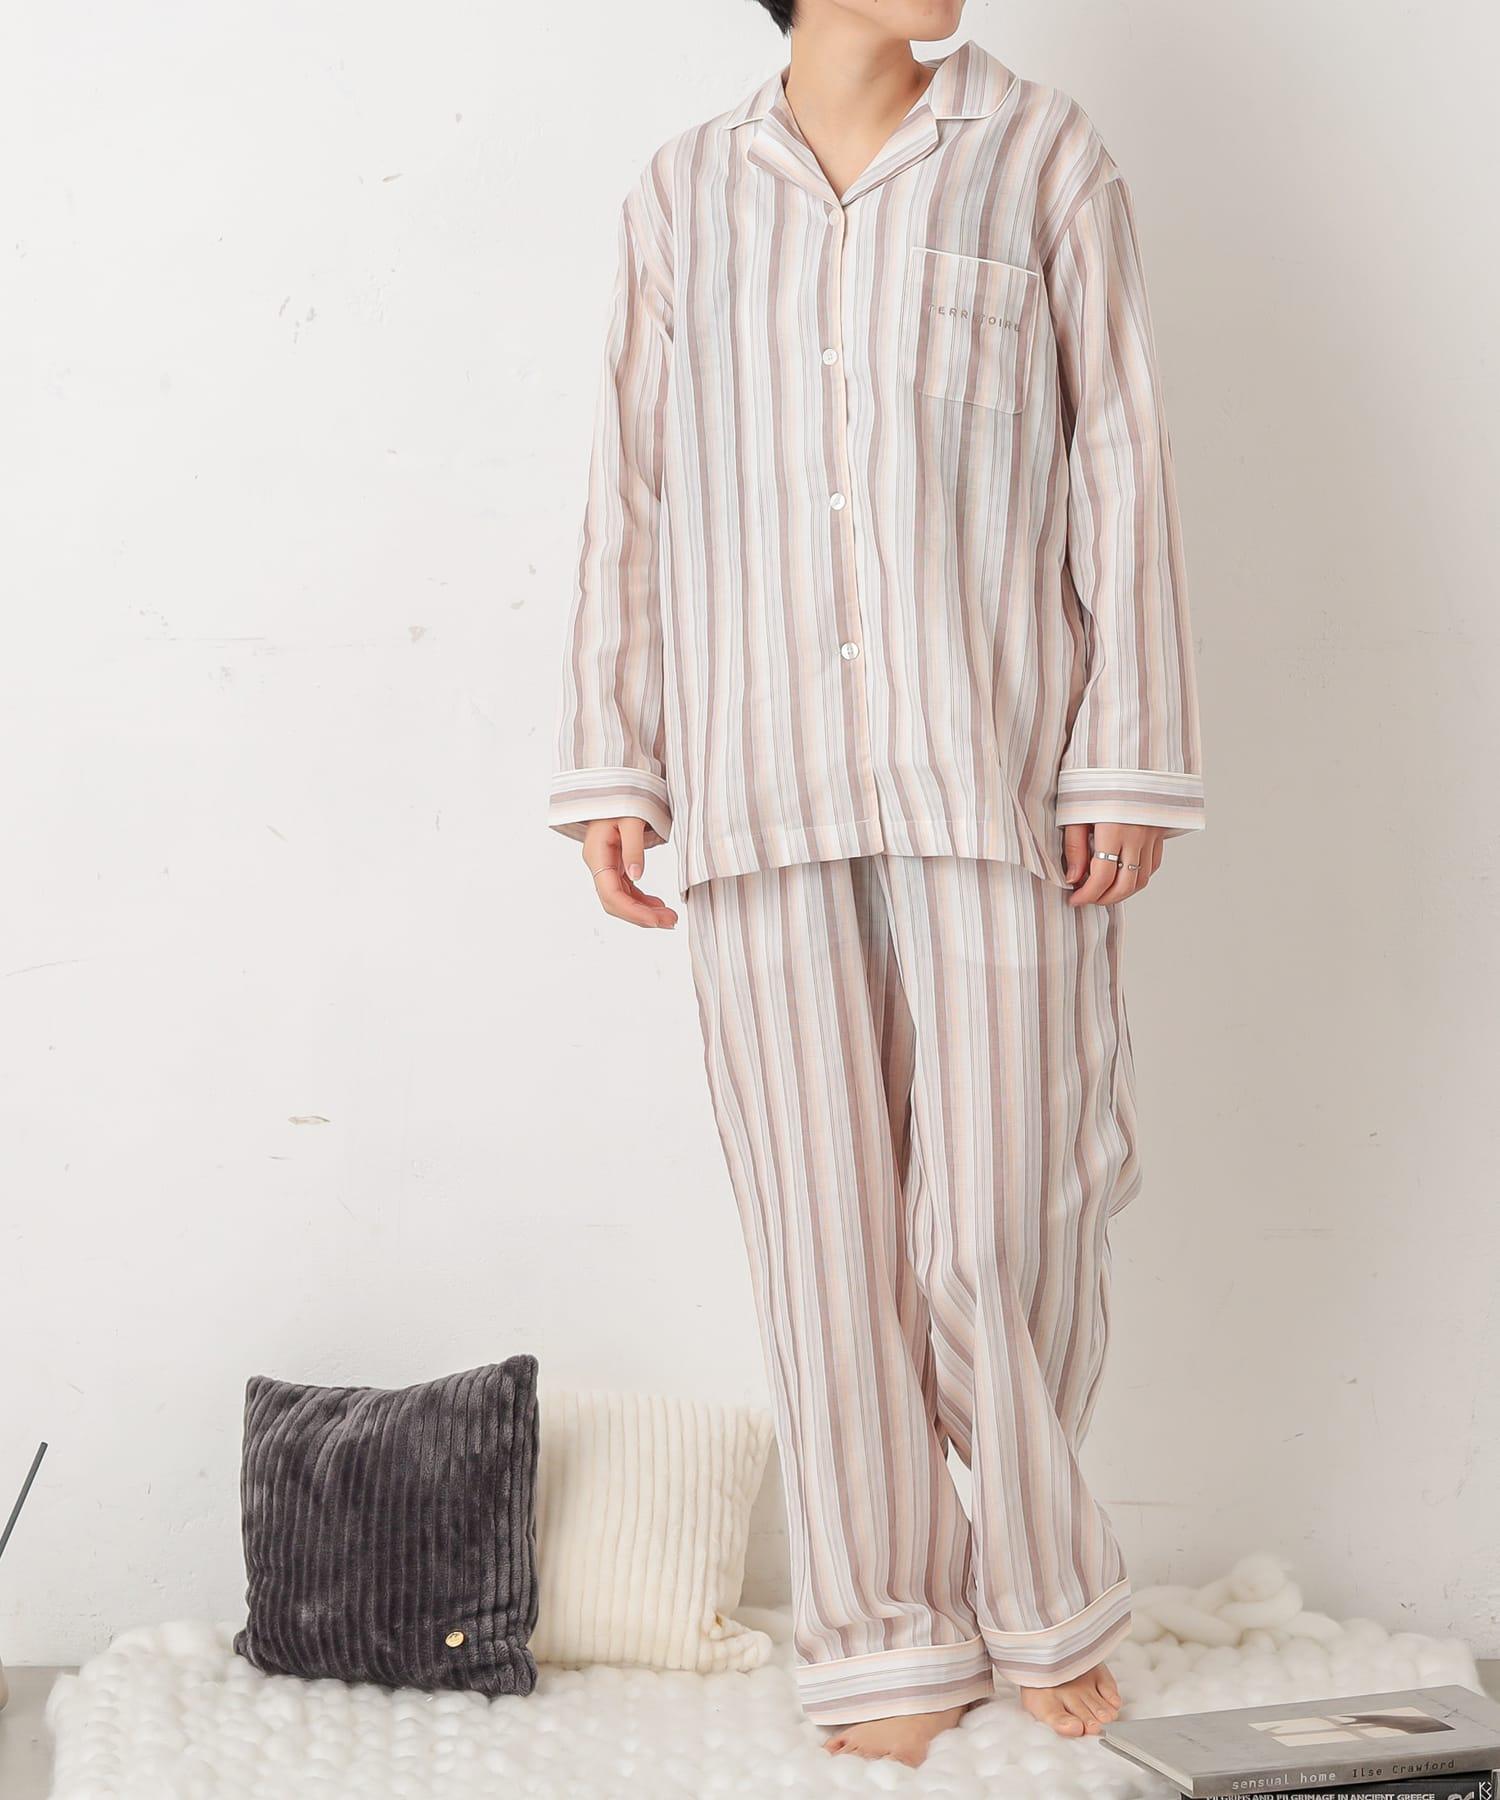 TERRITOIRE(テリトワール) LADIES軽やかライトガーゼパジャマ 上下セット